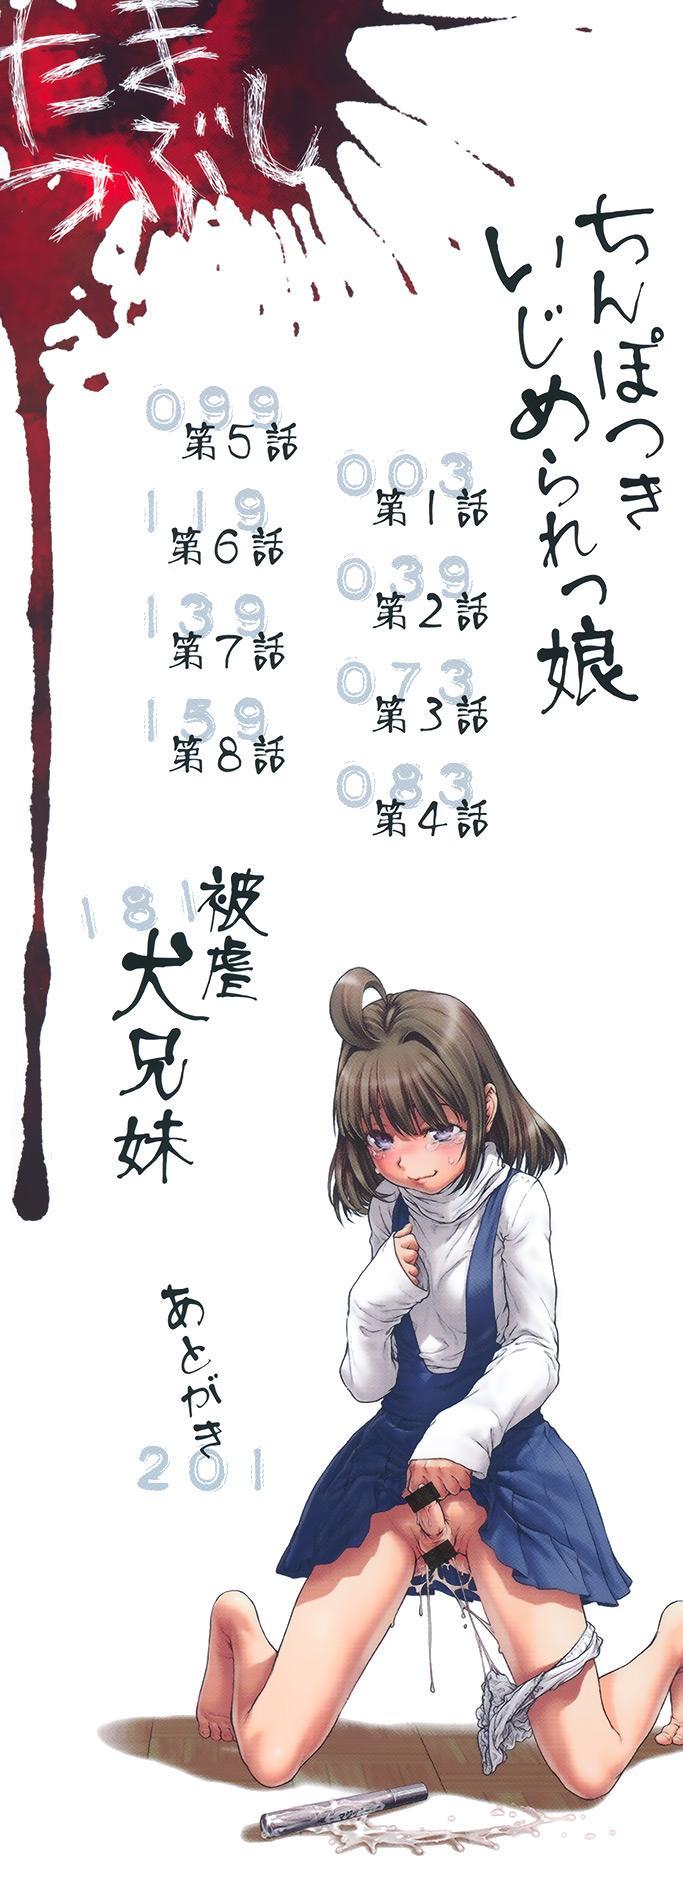 [Sannyuutei Shinta] Chinpotsuki Ijimerarekko | «Dickgirl!», The Bullying Story - Ch. 1-4 [English] [34th squad] 3